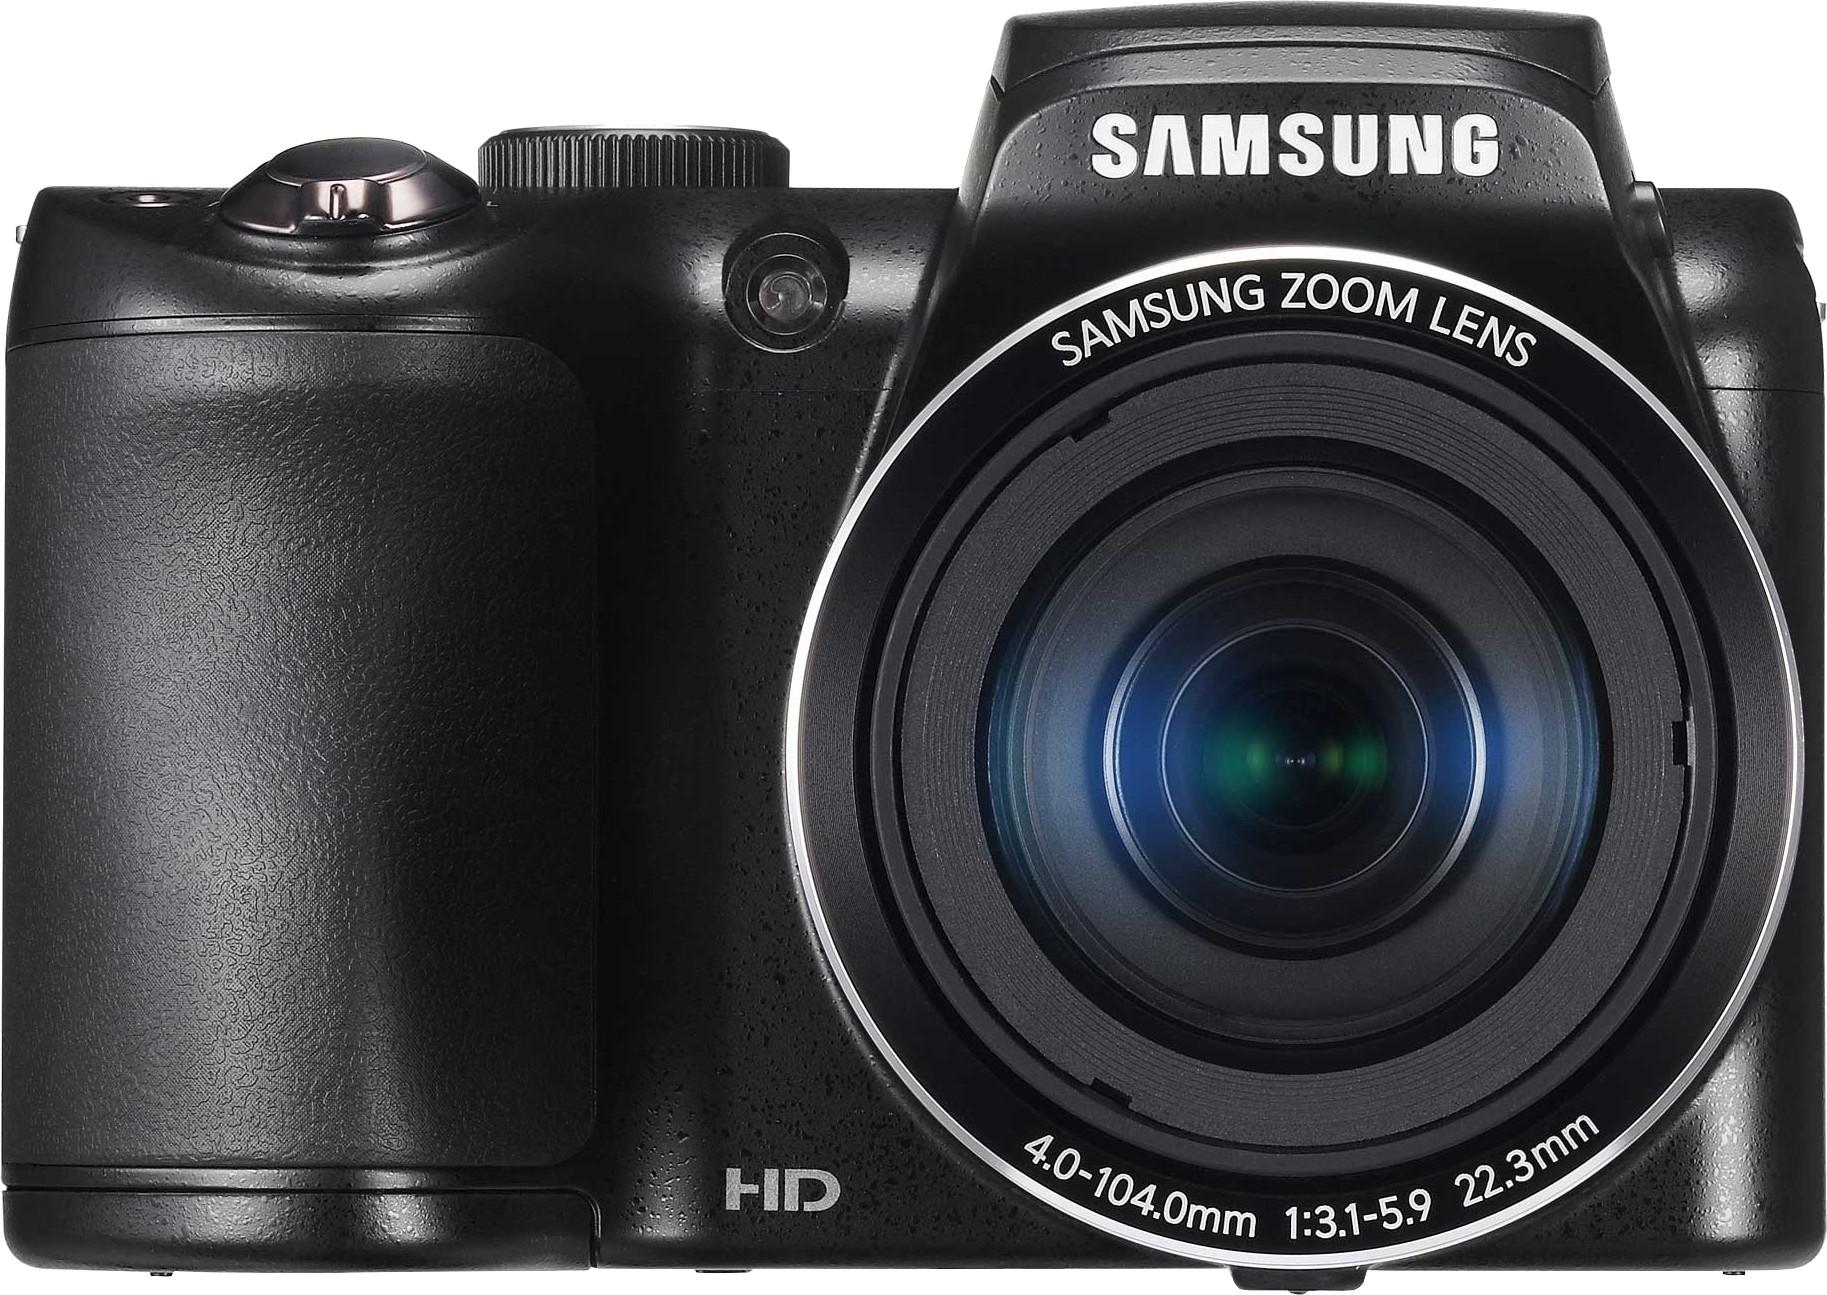 SAMSUNG WB100 Point & Shoot Camera(Black)